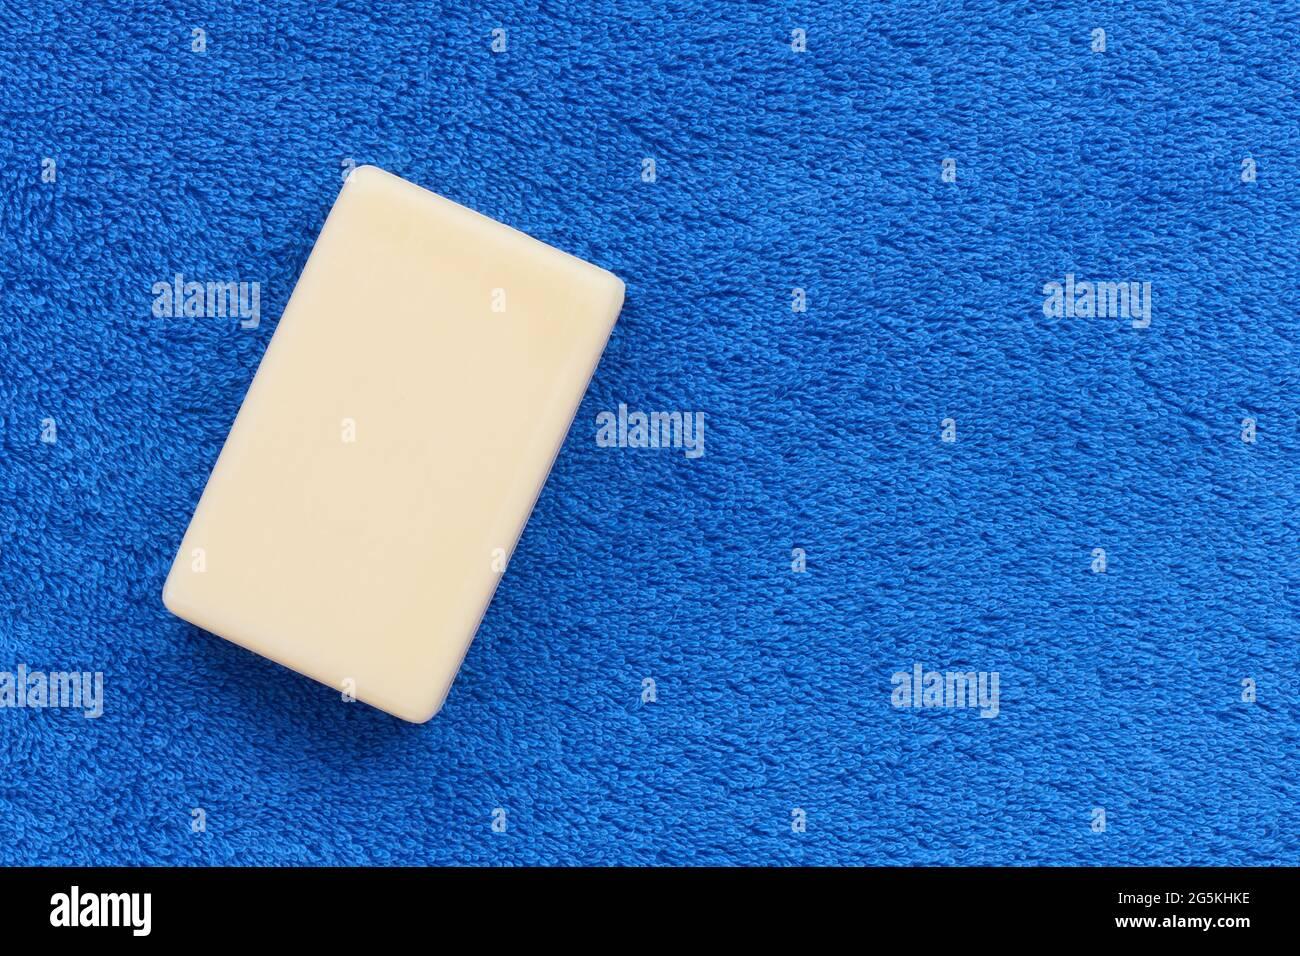 Barra blanca de jabón sobre suave toalla rústica azul con espacio de copia, concepto de higiene Foto de stock